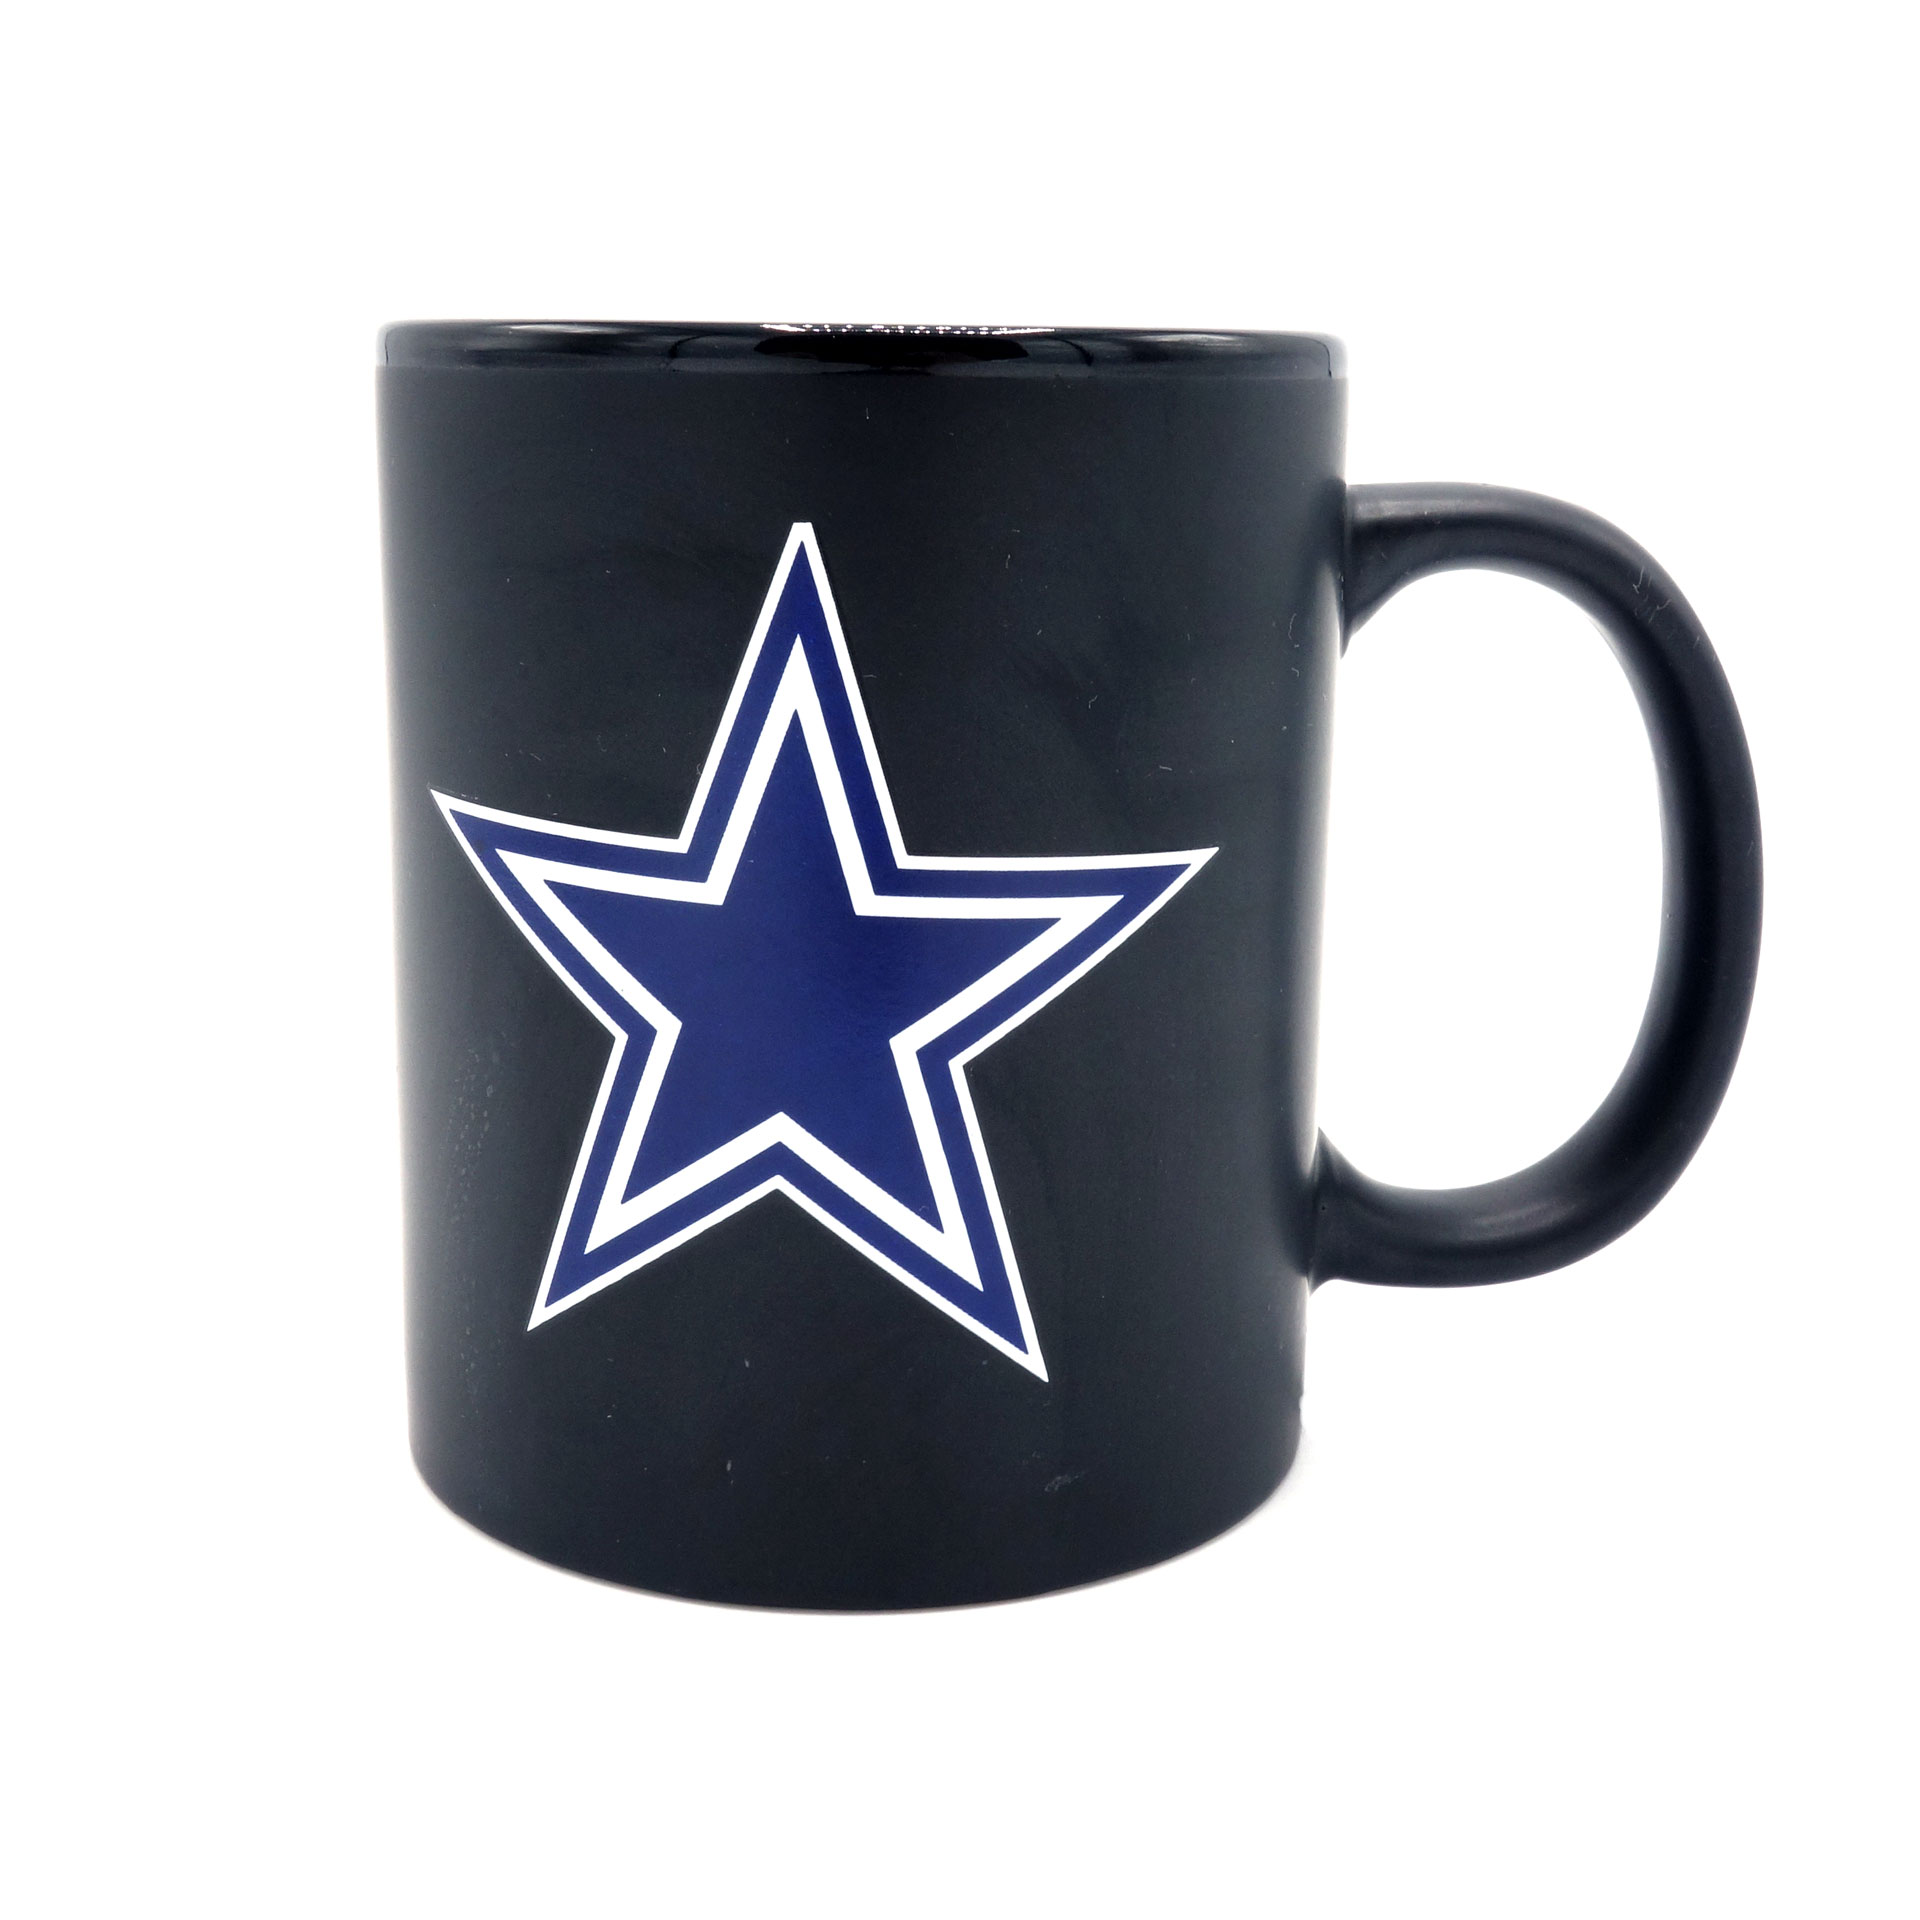 NFL Tasse Dallas Cowboys Black Matte Two Tone